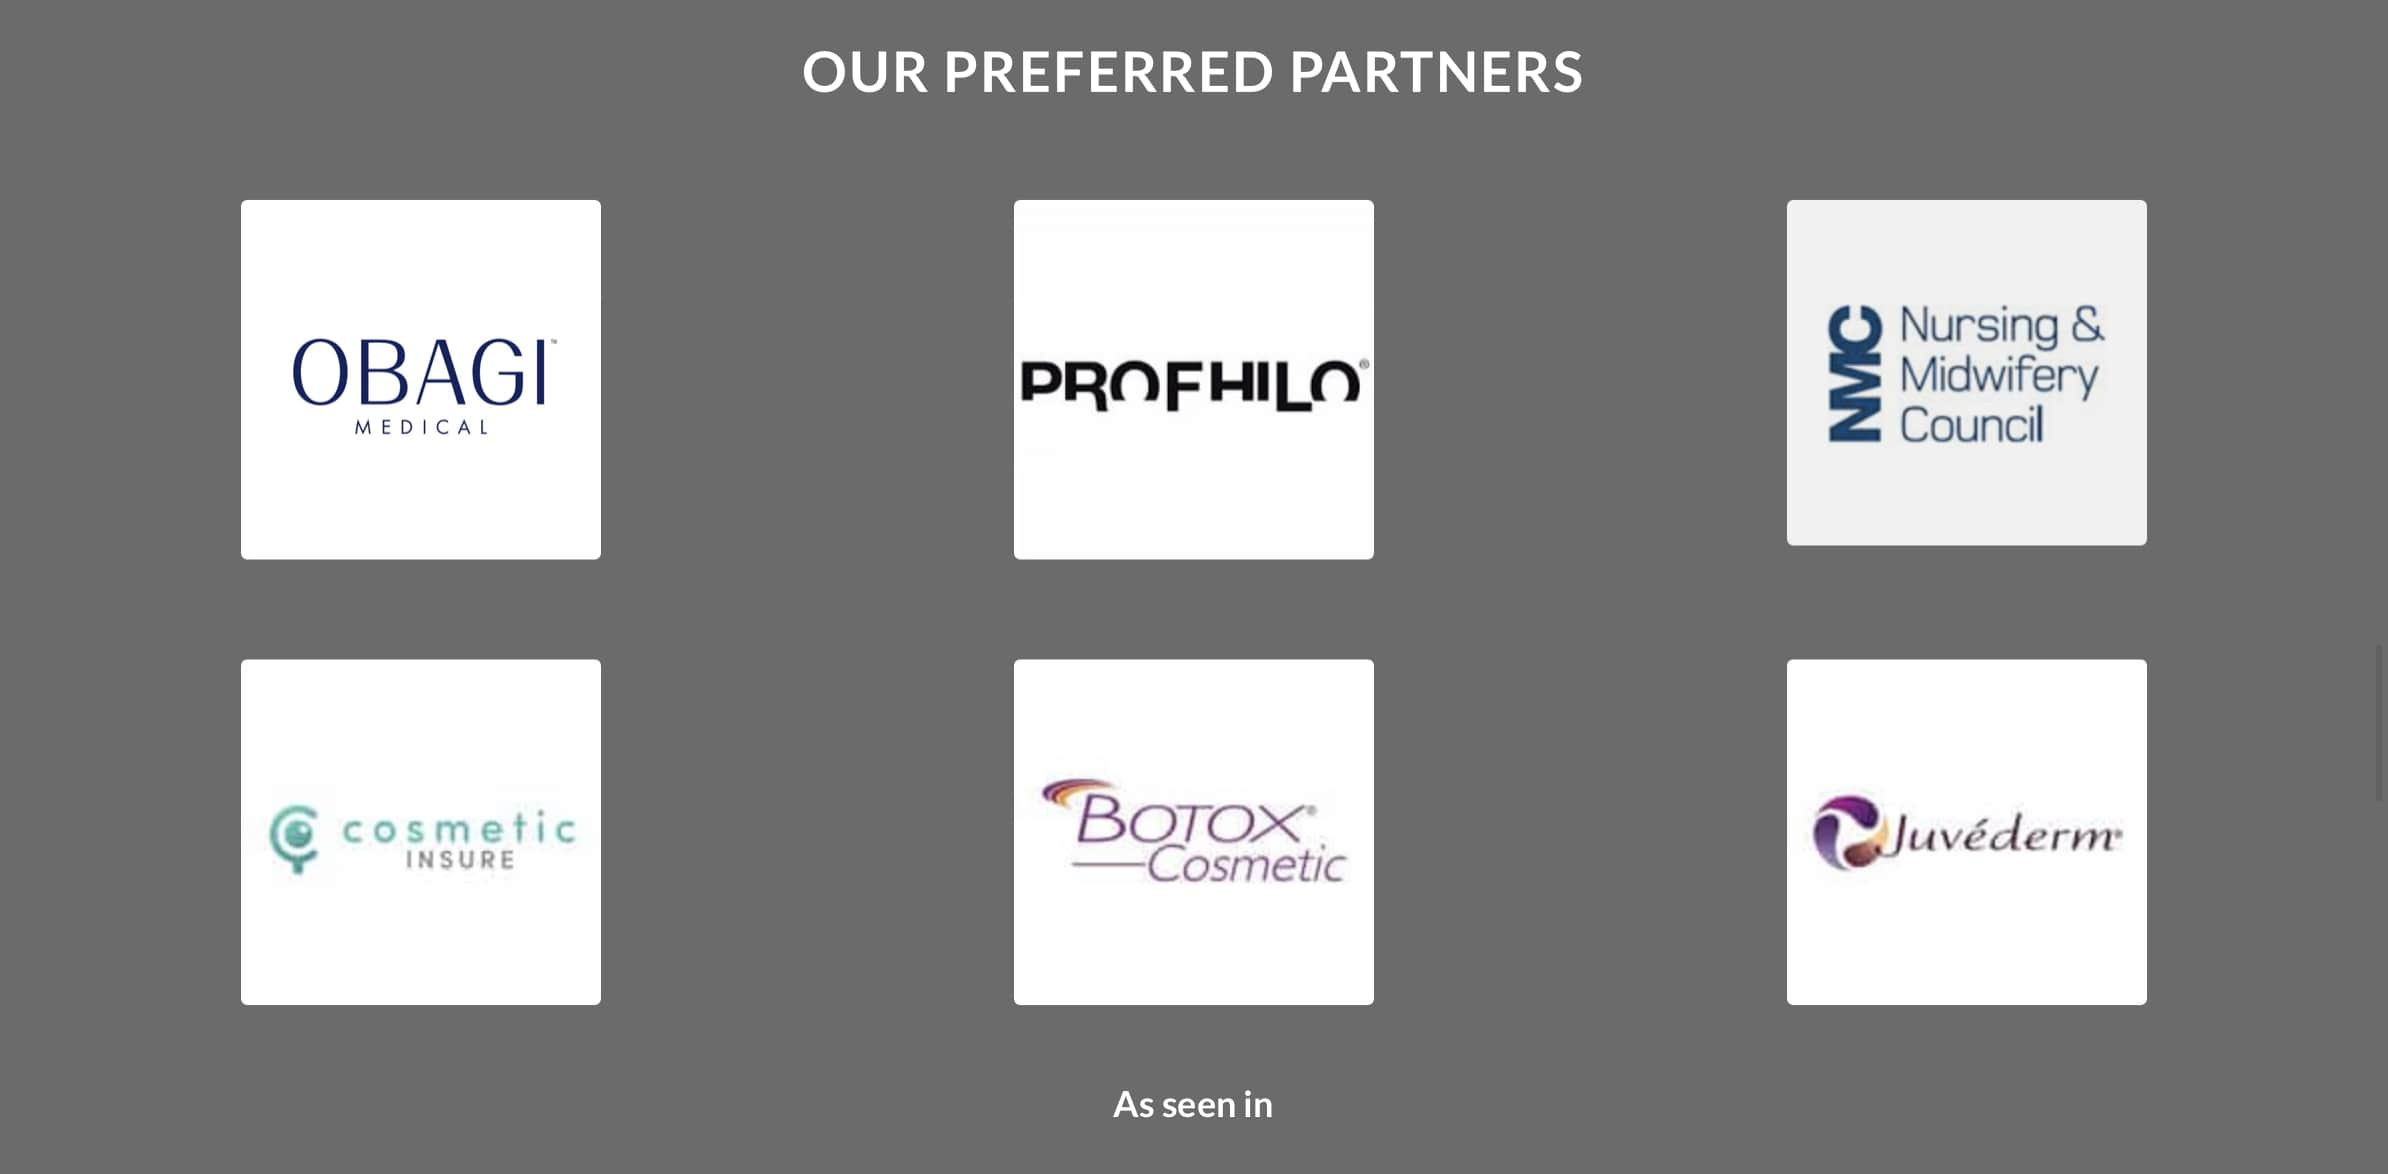 Austin Brewer Facial Aesthetics Preferred Partners Obagi Profhilo NMC Cosmetic insure Botox Juvederm